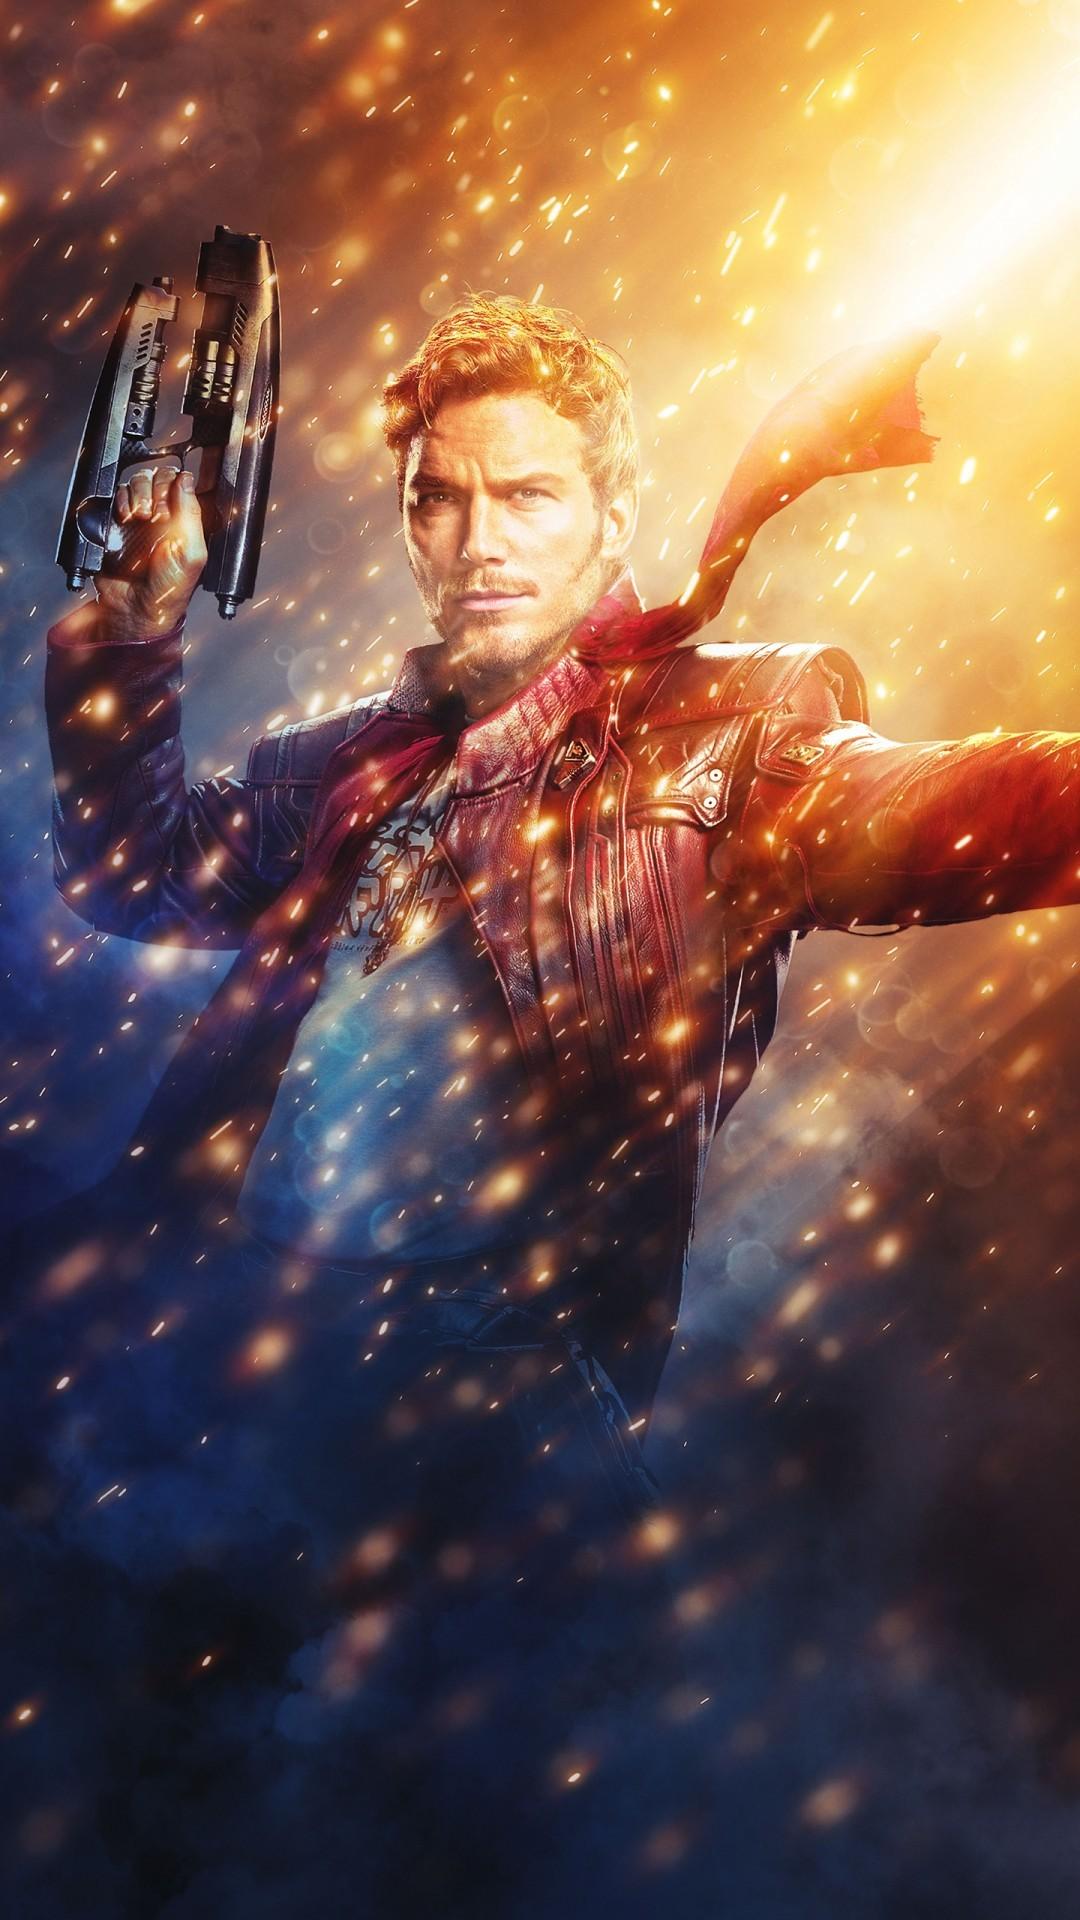 Free Chris Pratt as Star-Lord phone wallpaper by jd602